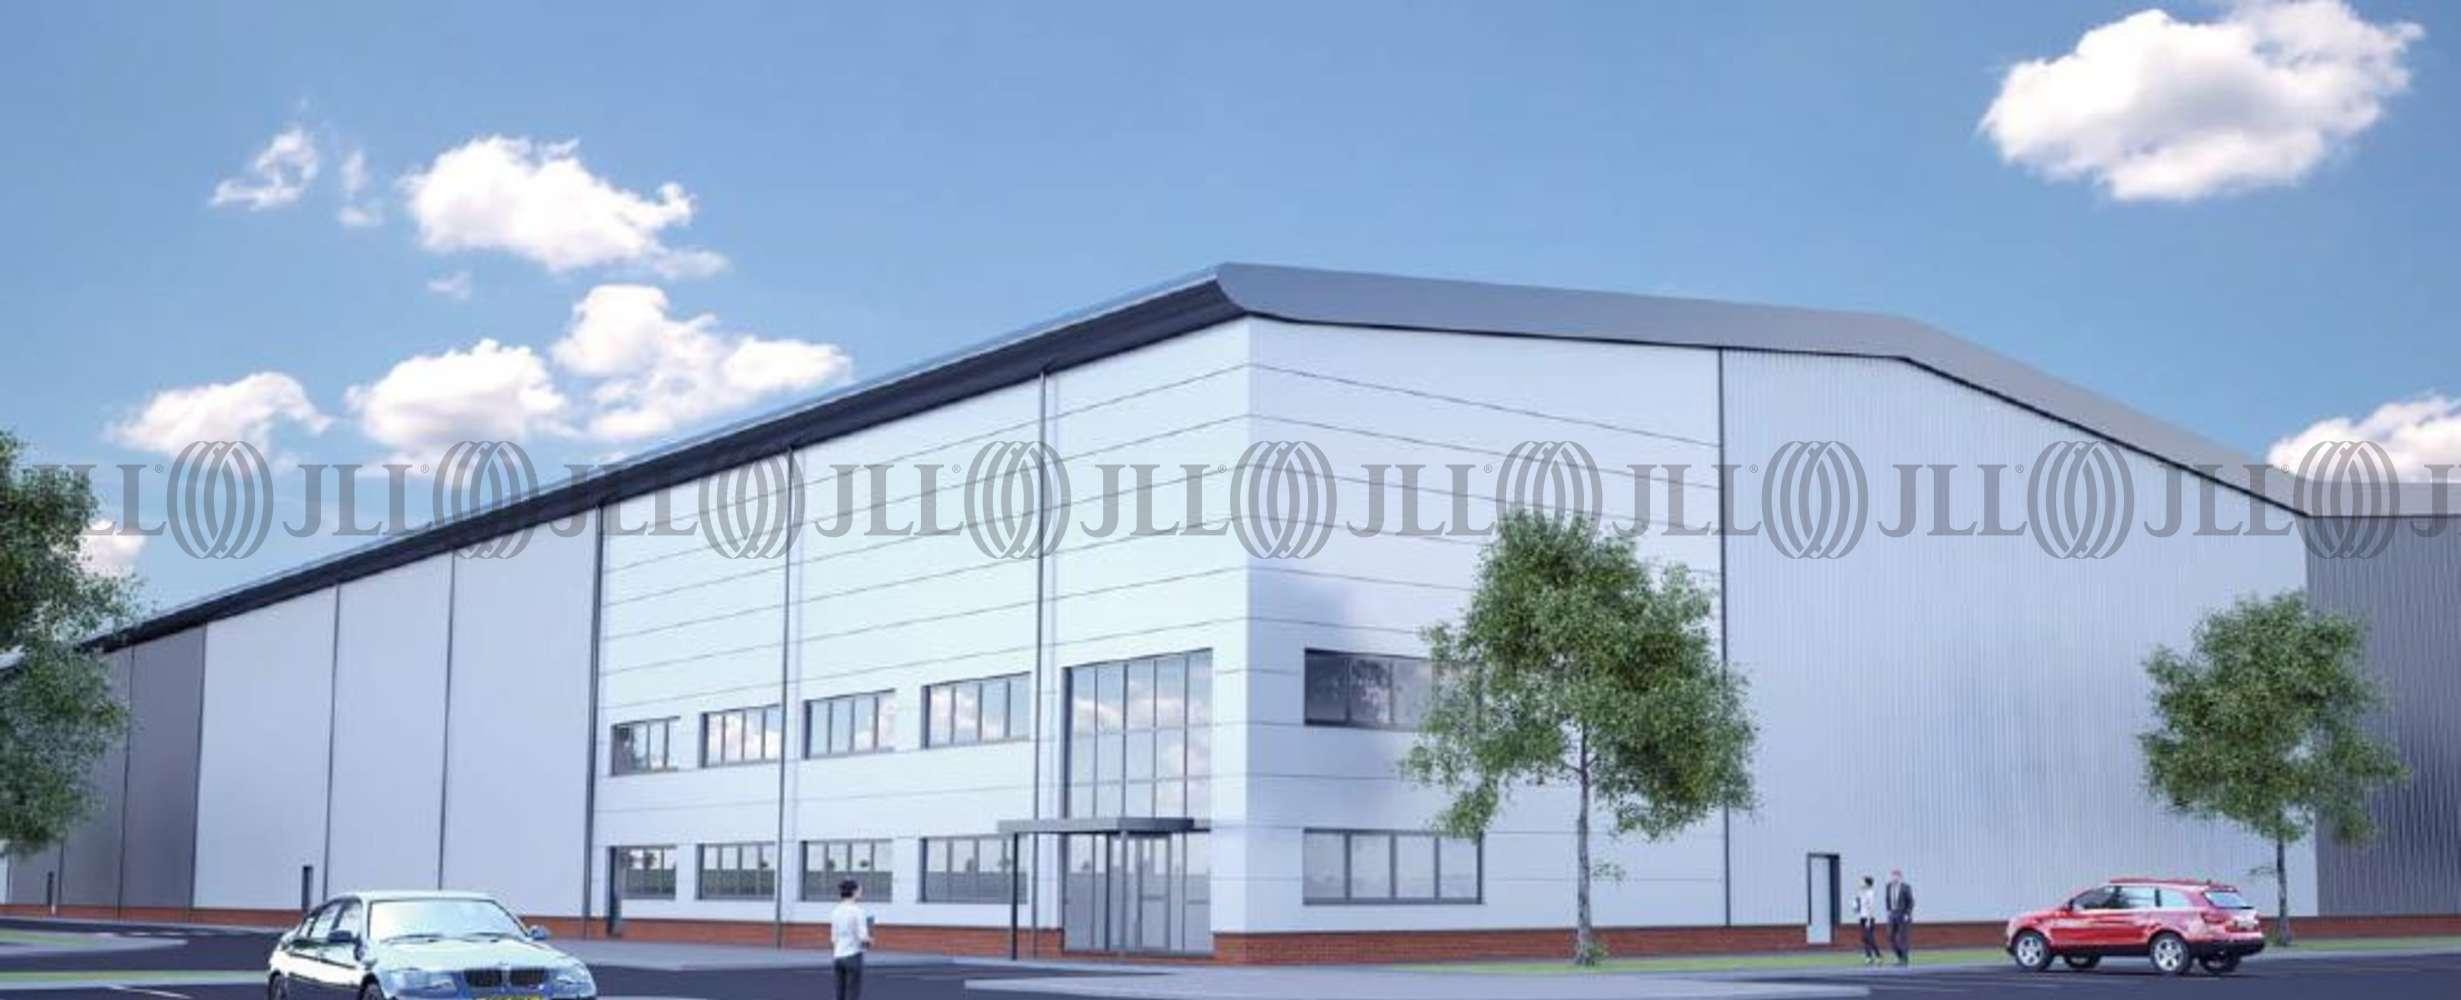 Industrial Swindon, SN3 4AD - Radway Point - 1